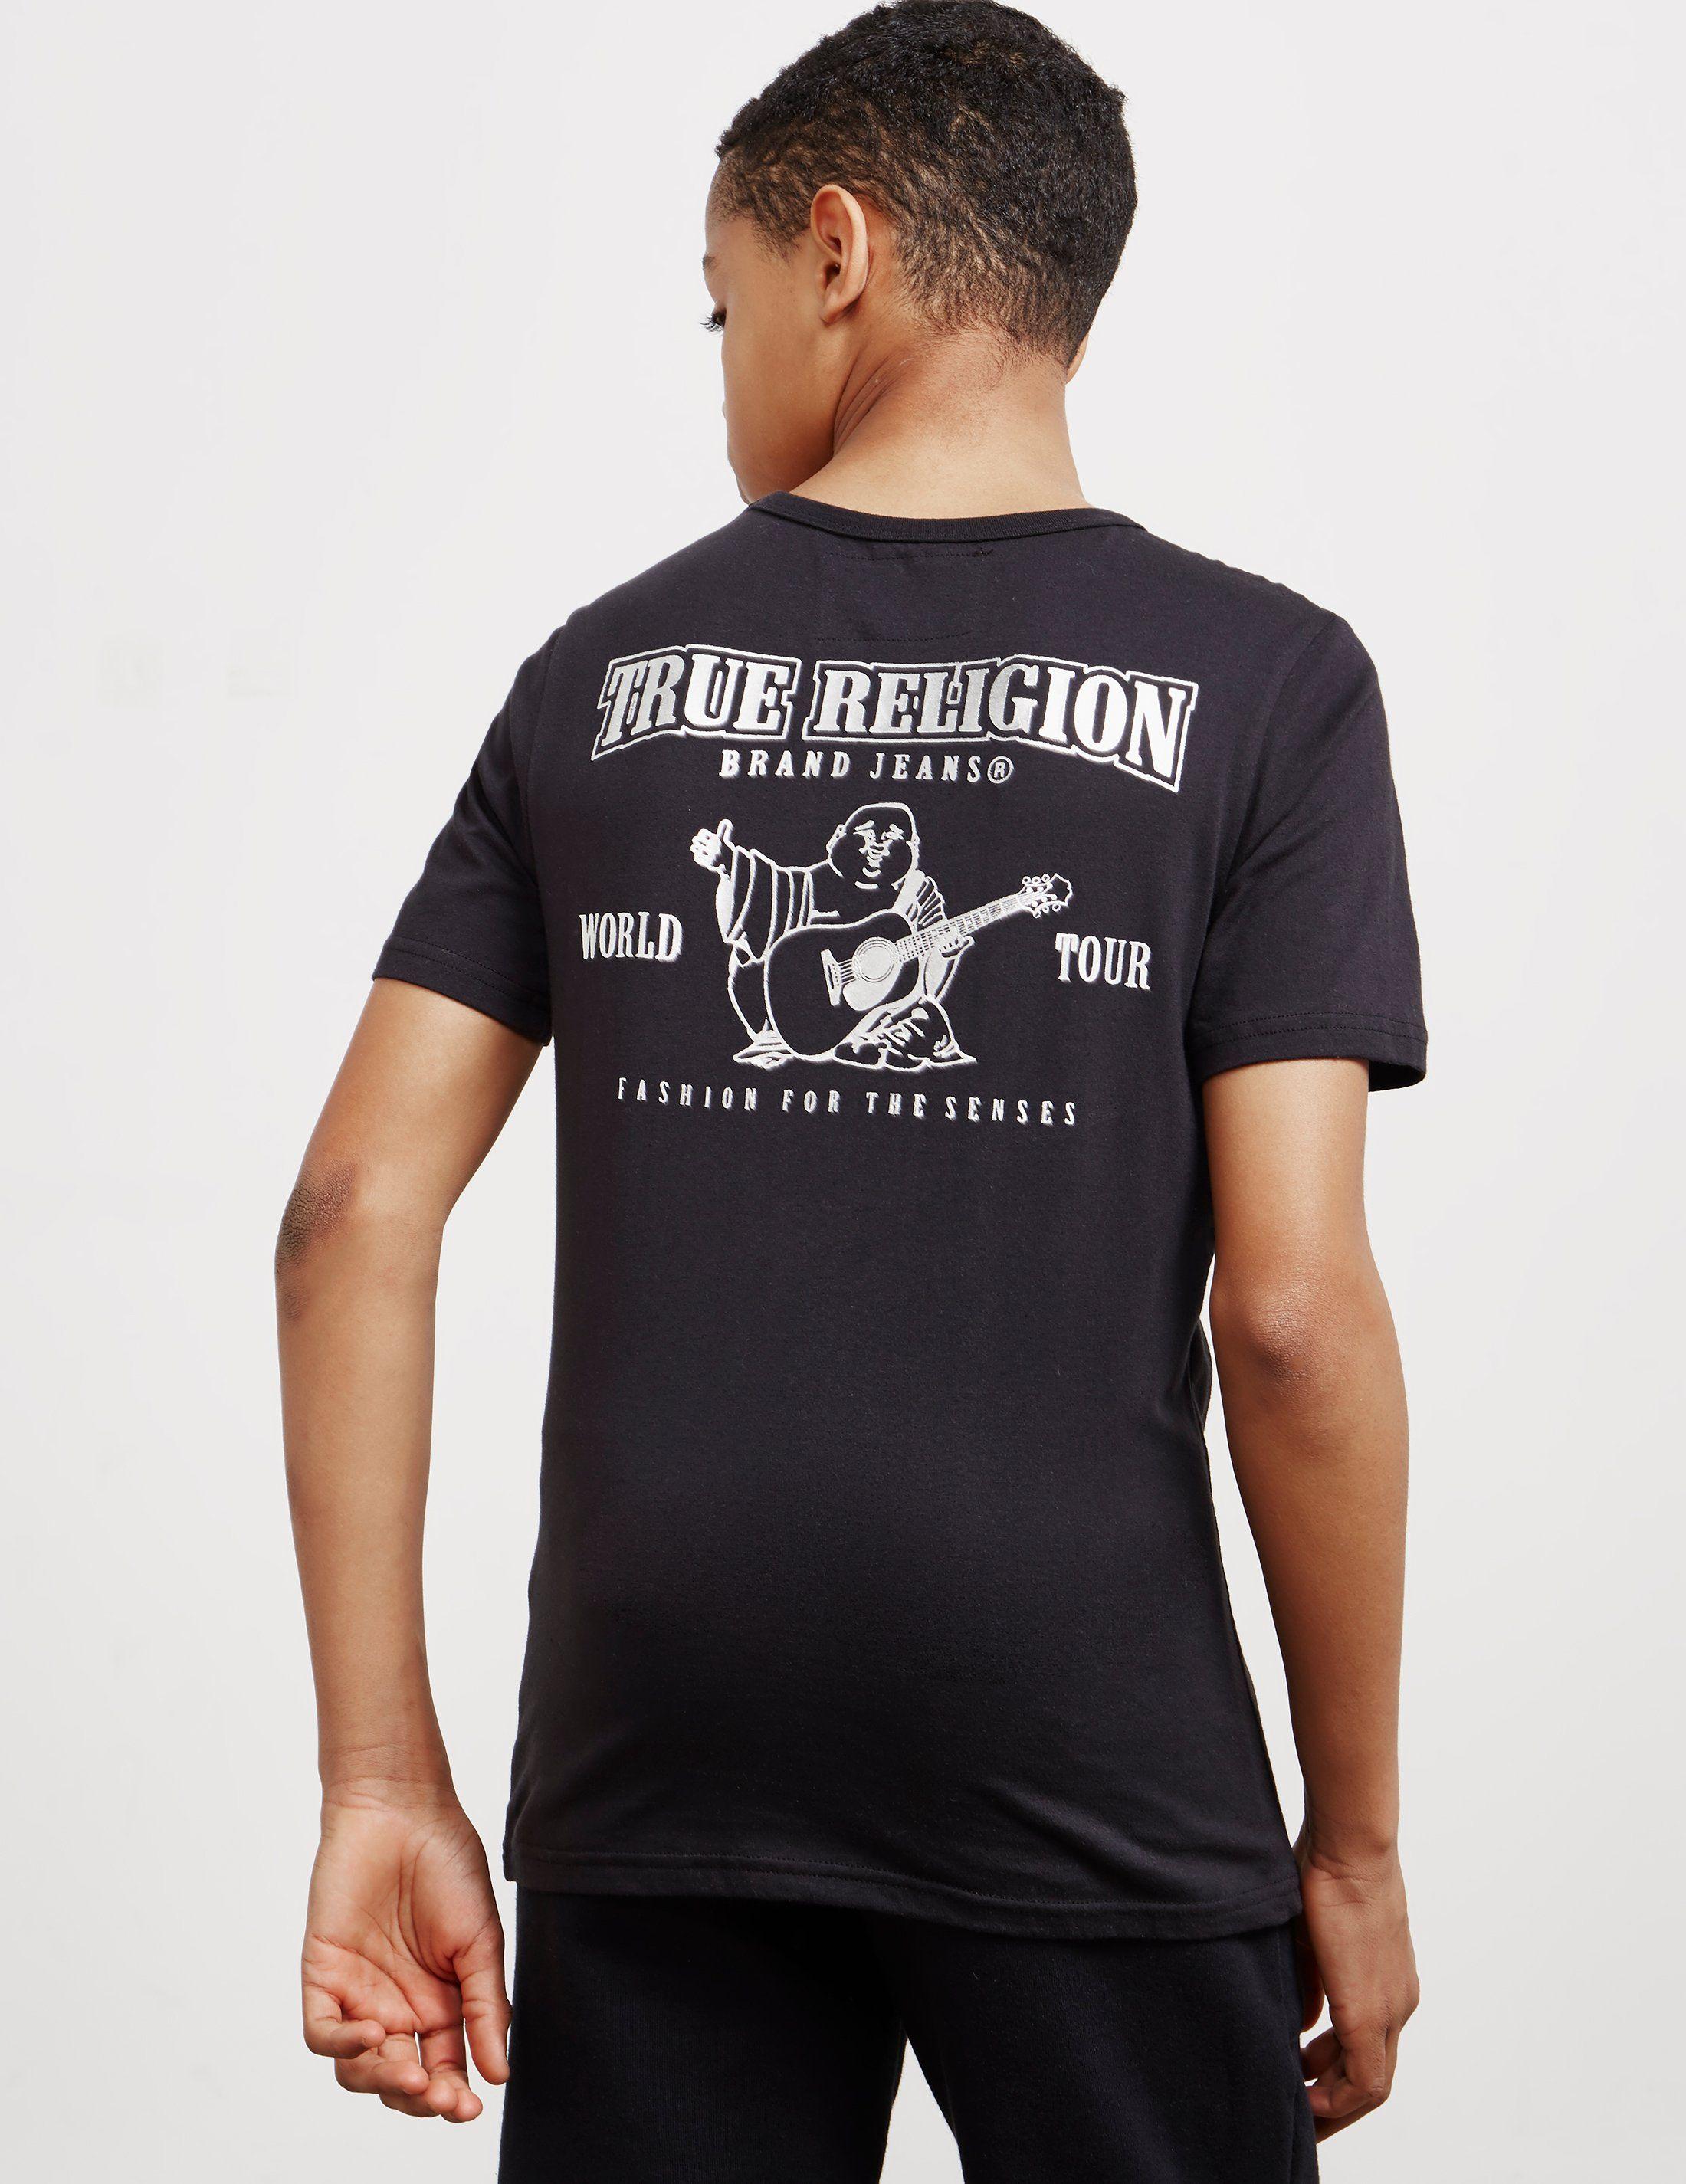 True Religion Horseshoe Logo Short Sleeve T-Shirt